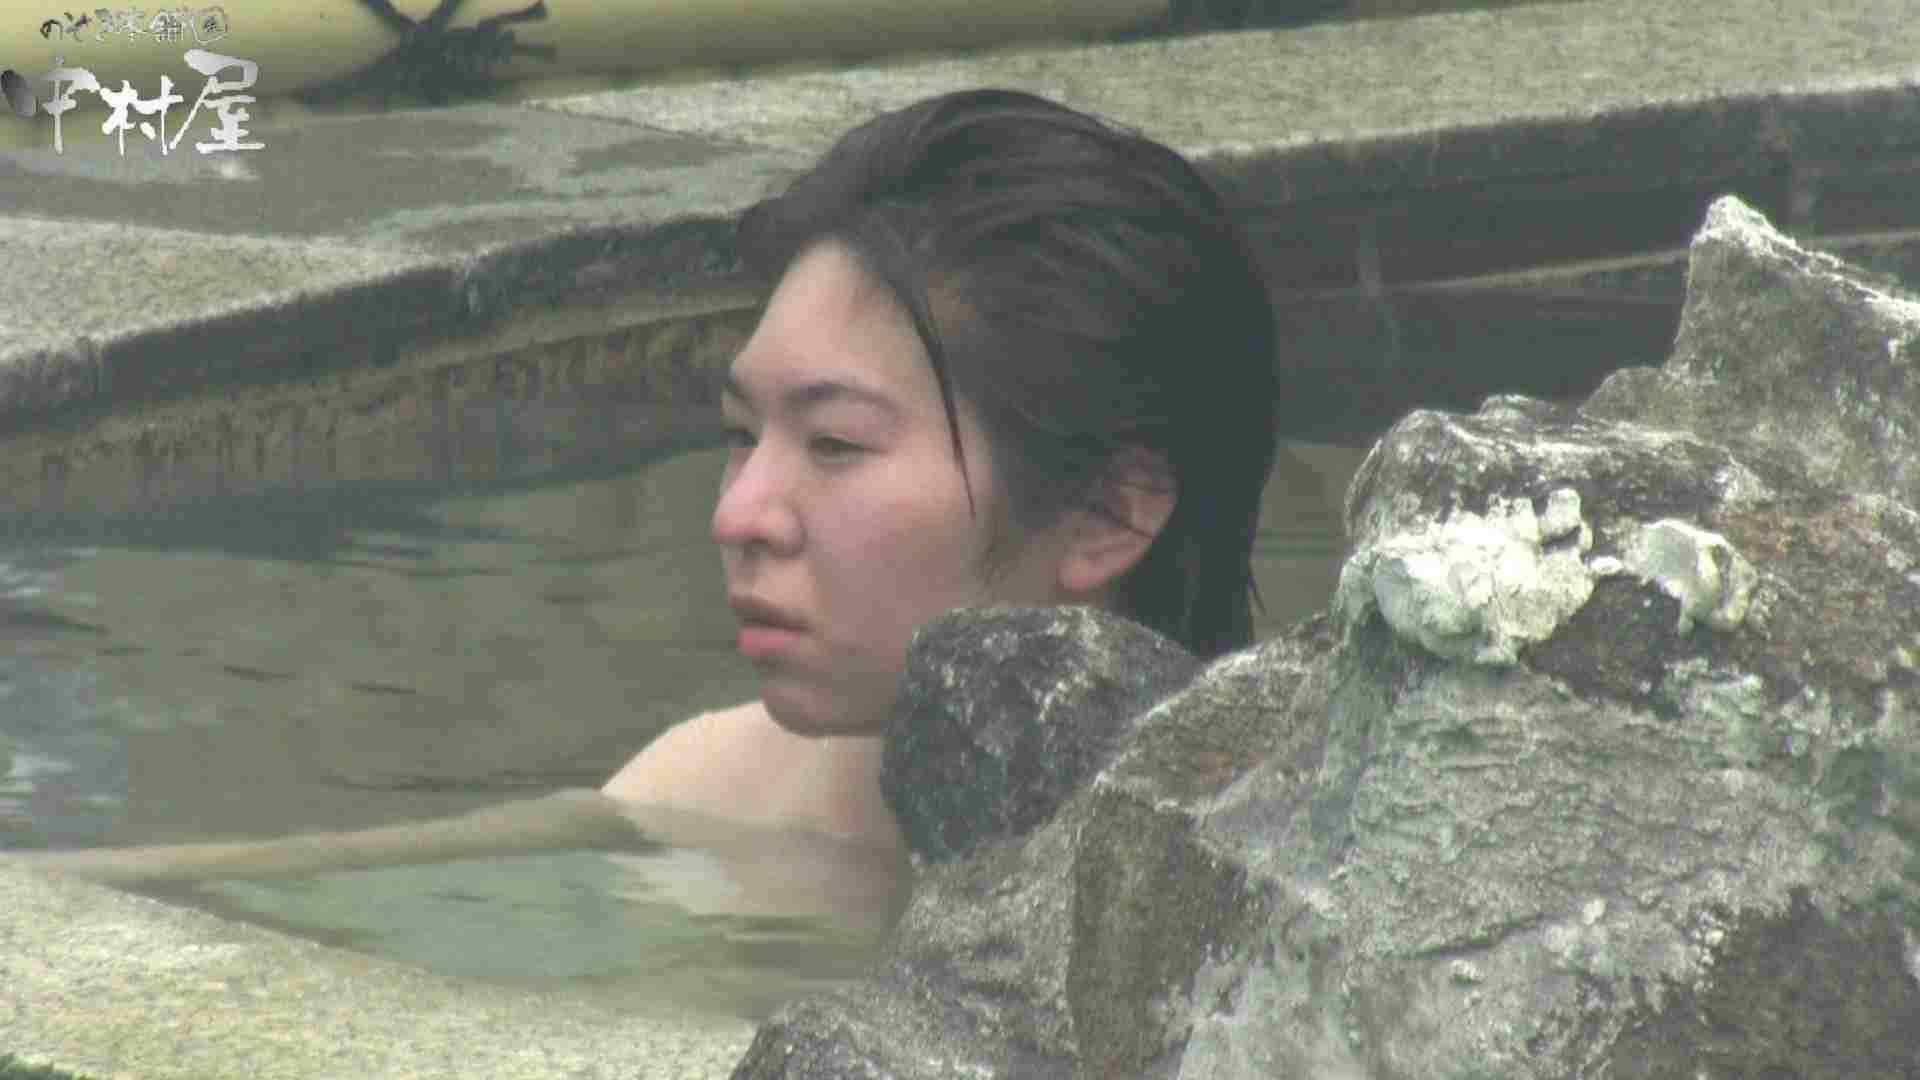 Aquaな露天風呂Vol.907 OL女体  95連発 39